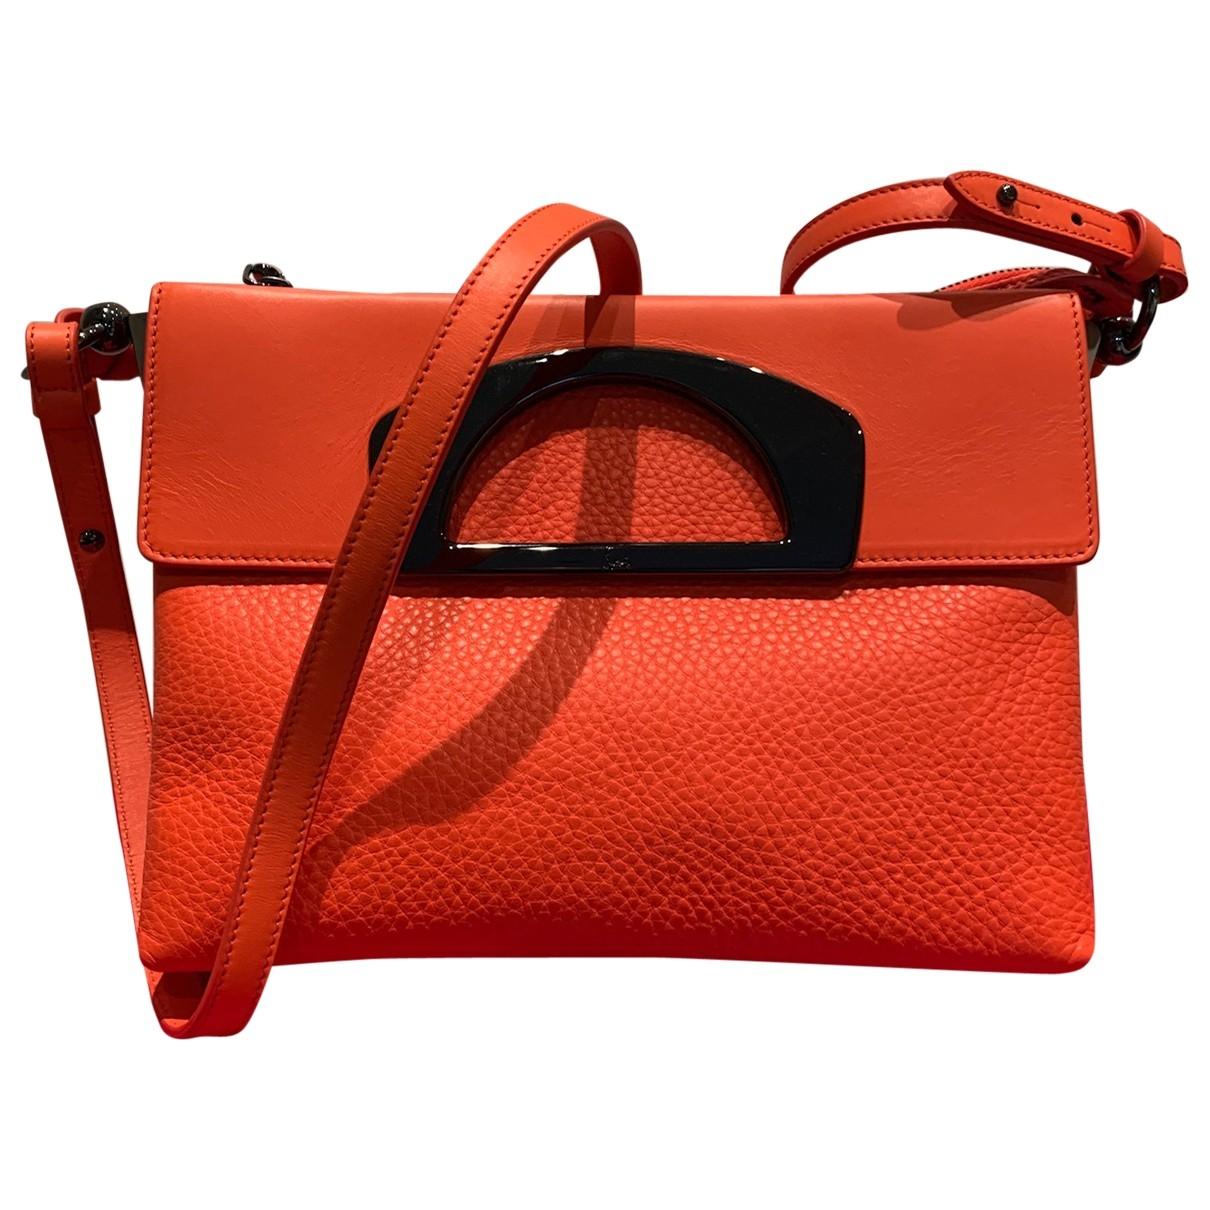 Christian Louboutin Passage Handtasche in  Orange Leder